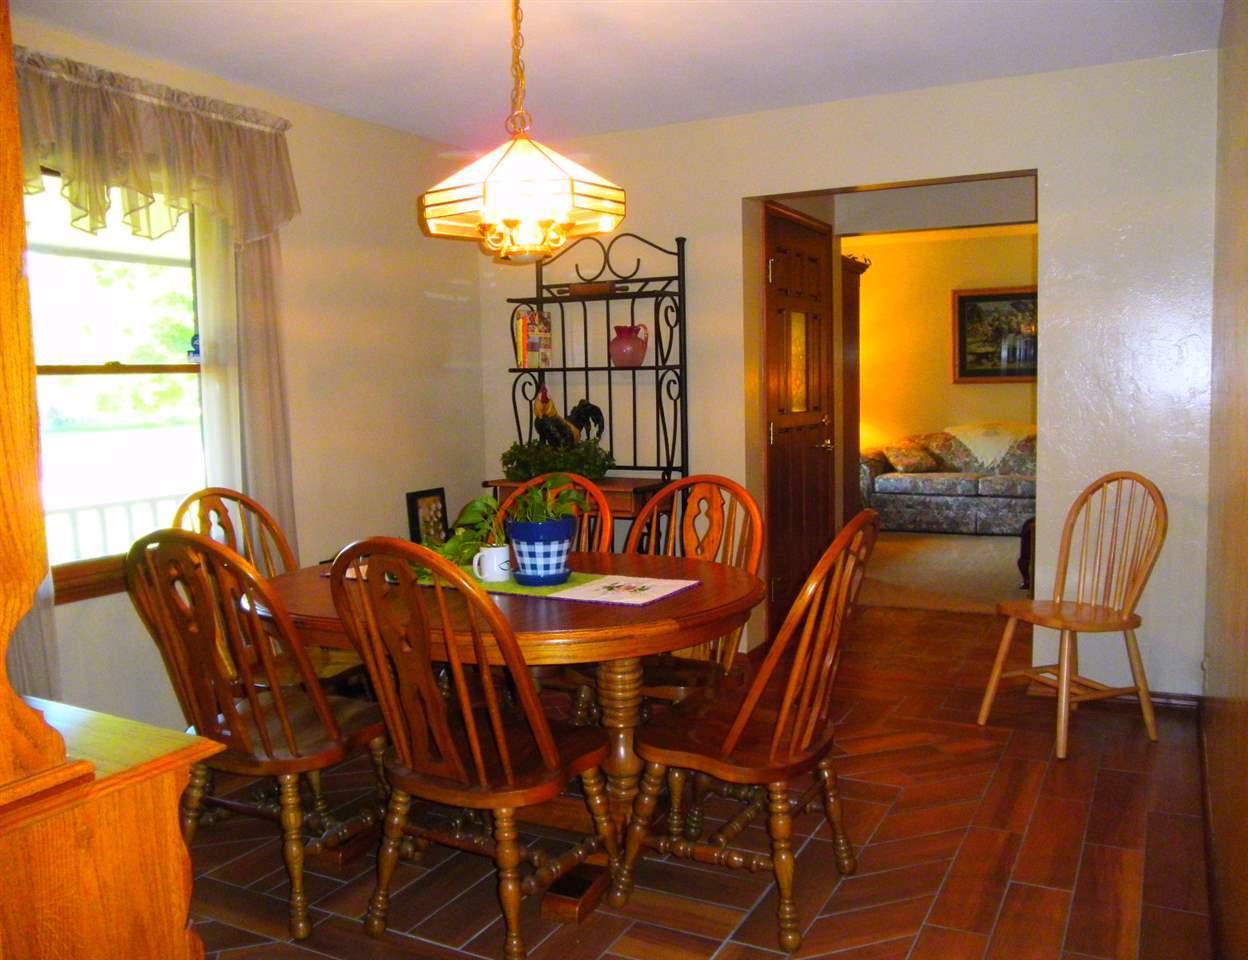 Sold Cross Sale W/ MLS | 32 Raintree Ponca City, OK 74604 3